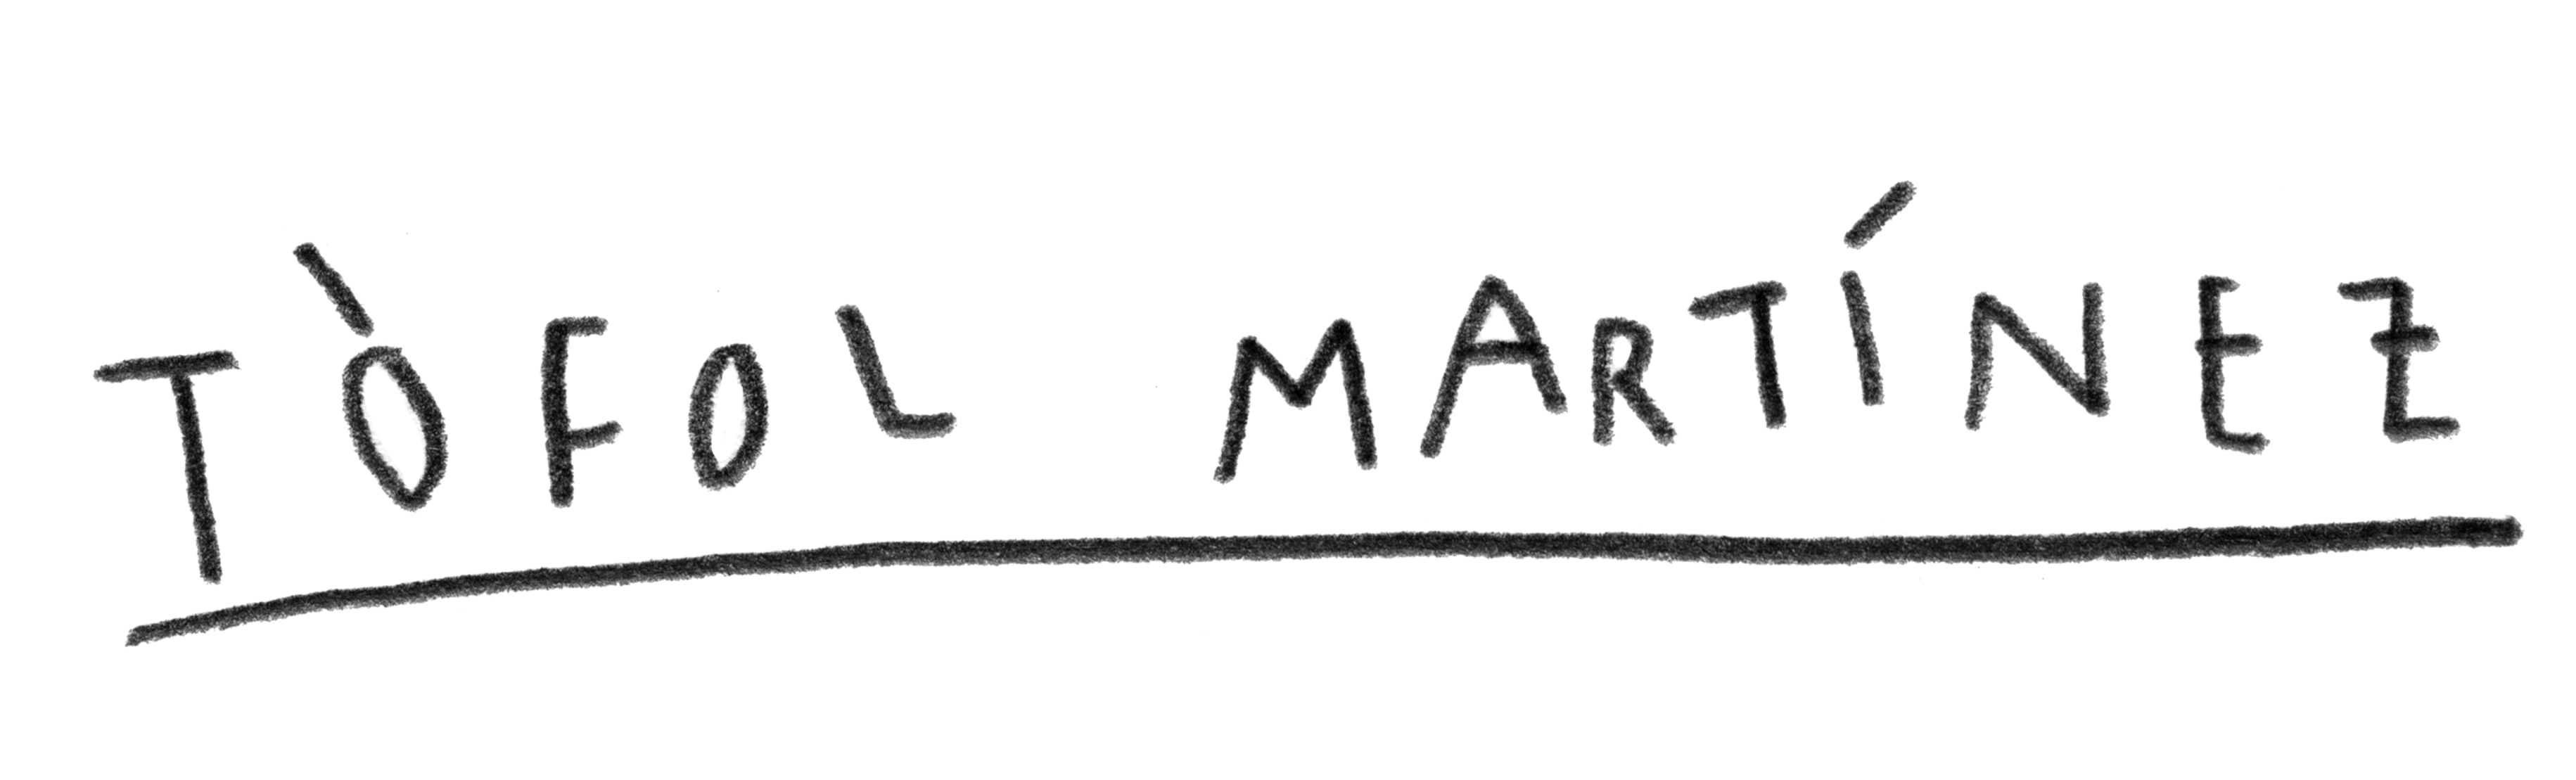 Tòfol Martínez Logo